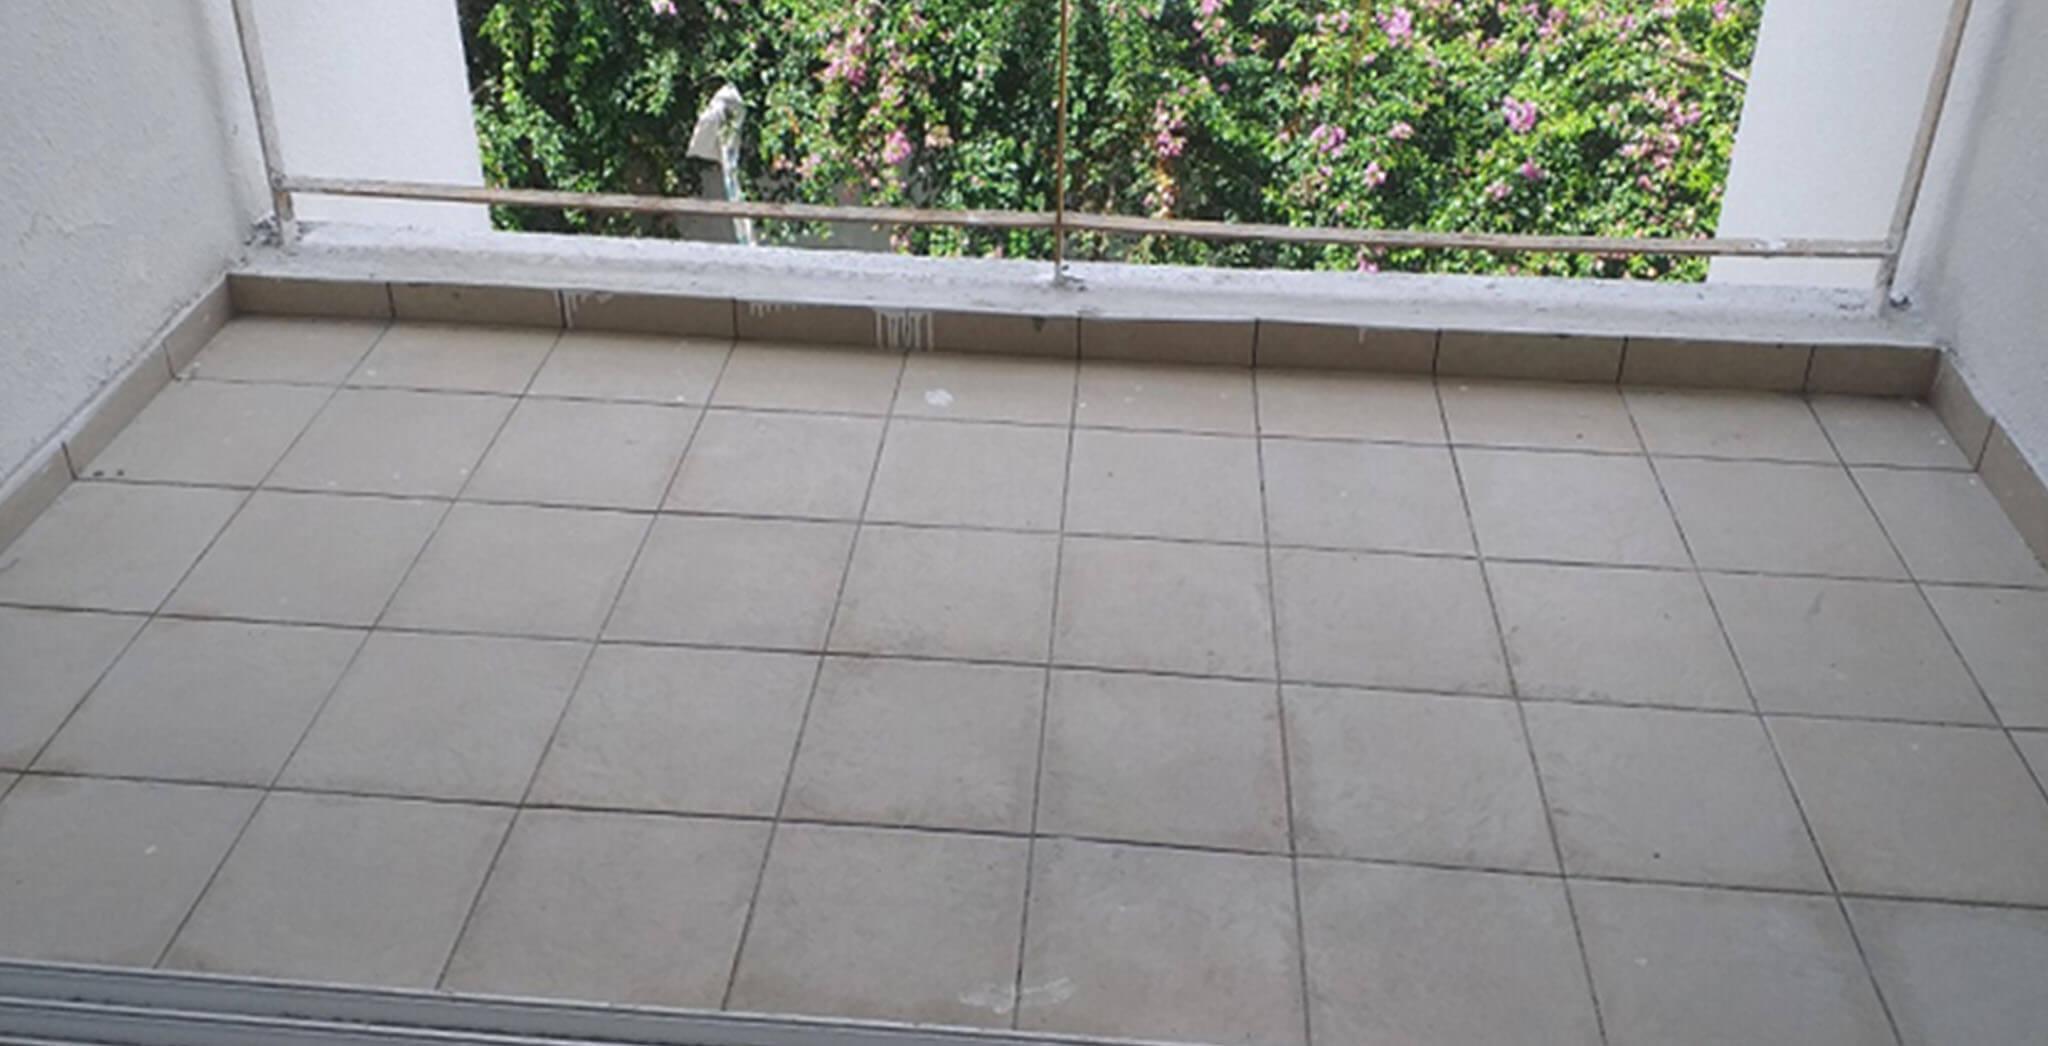 Jun 2021 - Blocks J, K, L, M, N and P: Balcony tiling work-in-progress